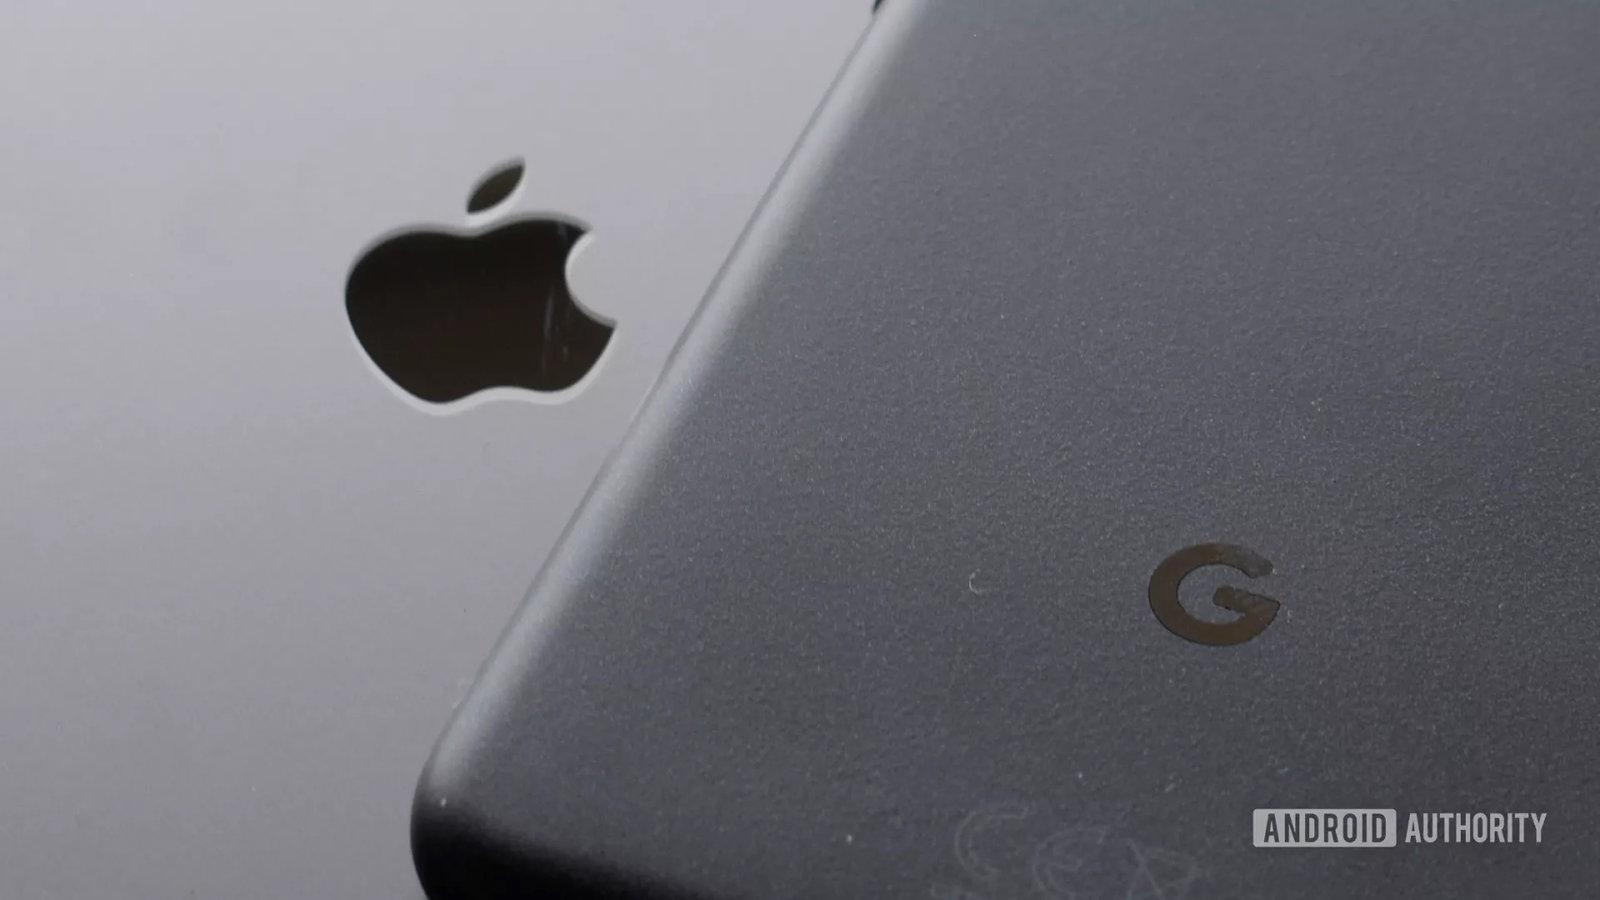 پیکسل ۶ اولین پاسخ واقعی گوگل به آیفون اپل است